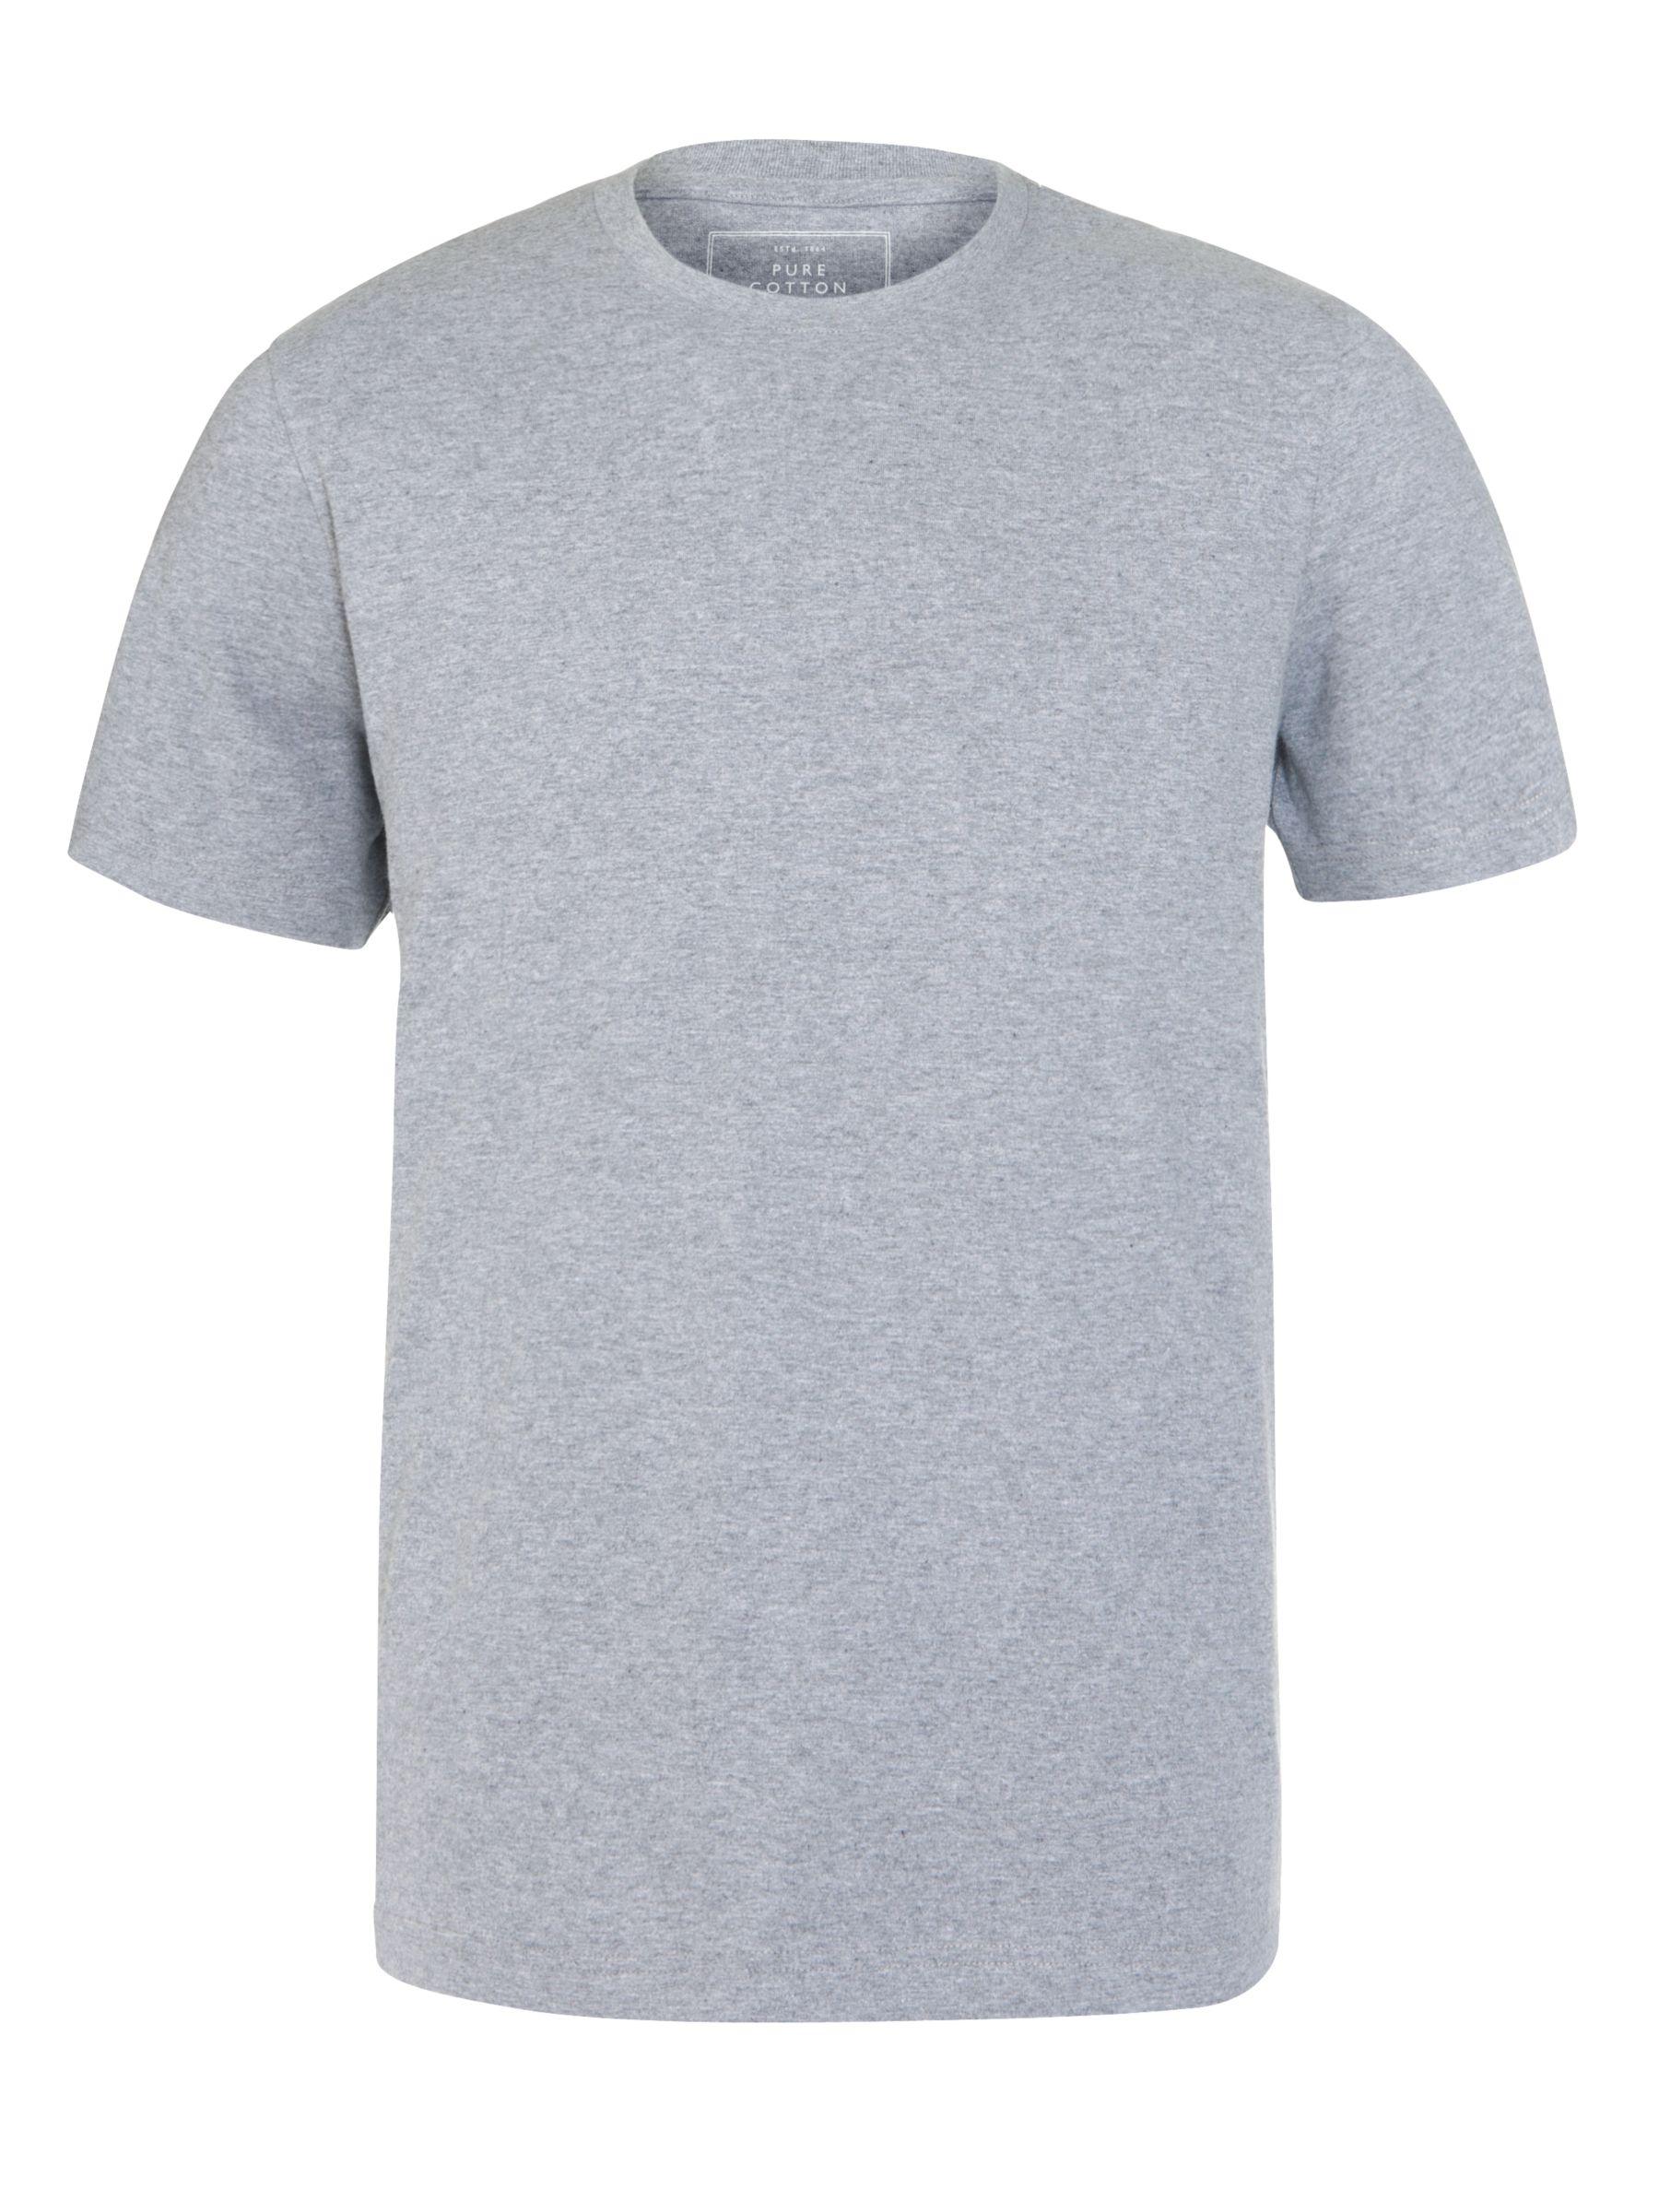 John Lewis Crew Neck Short Sleeve Lounge T-Shirt, Grey